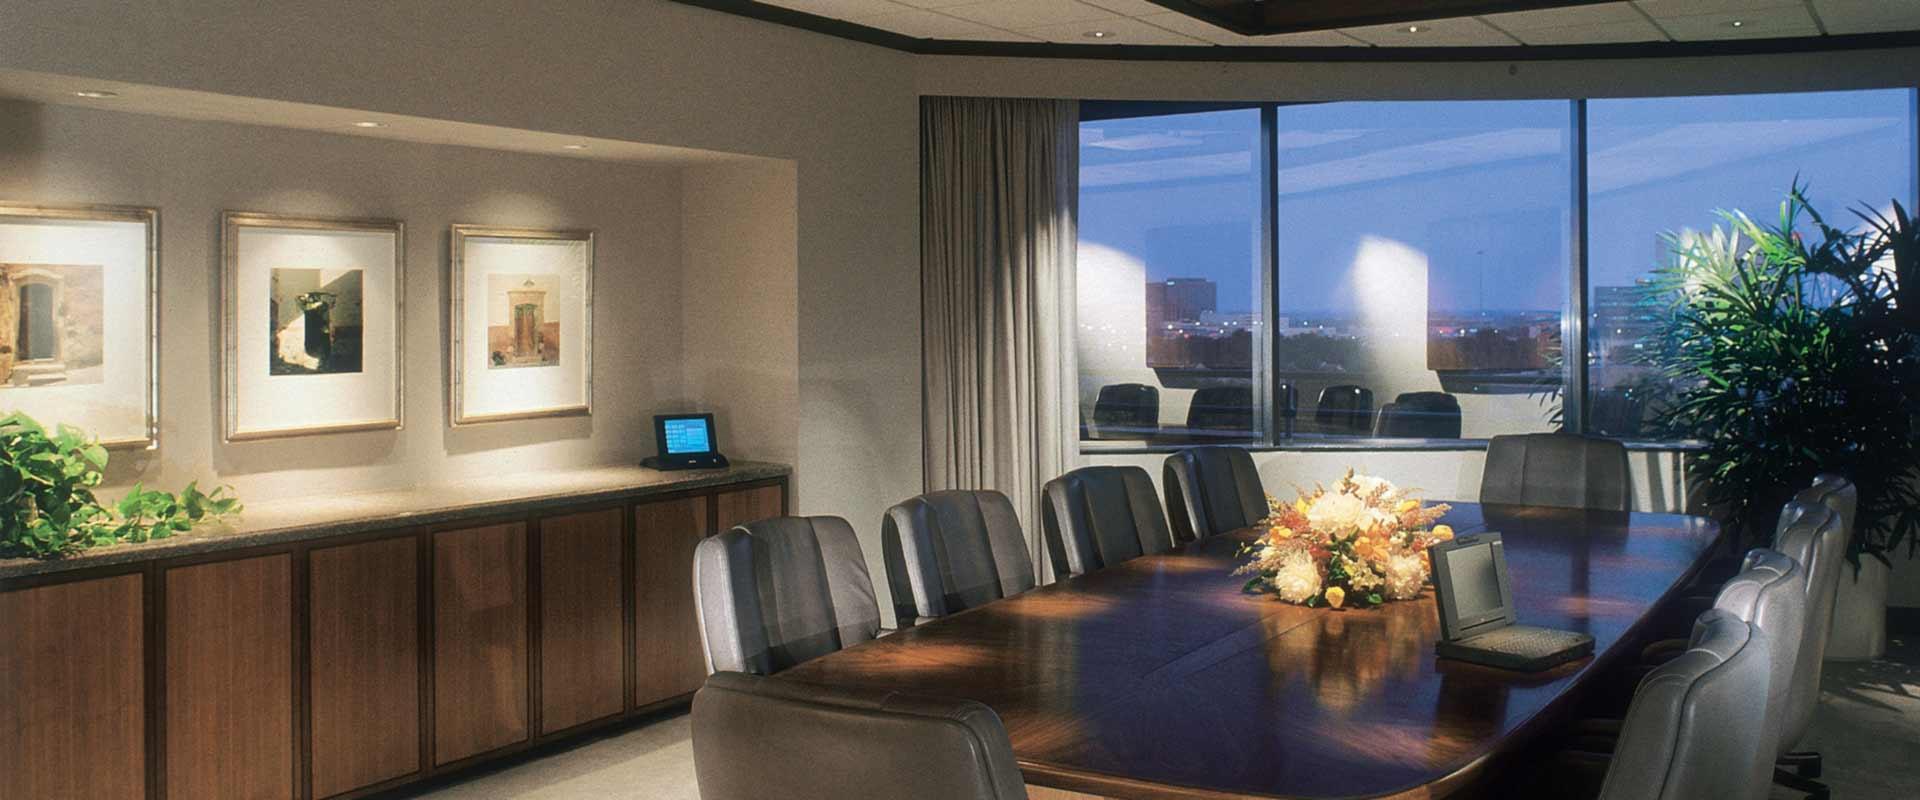 Conference Rooms Design Digital Signage Energy Management Nyc